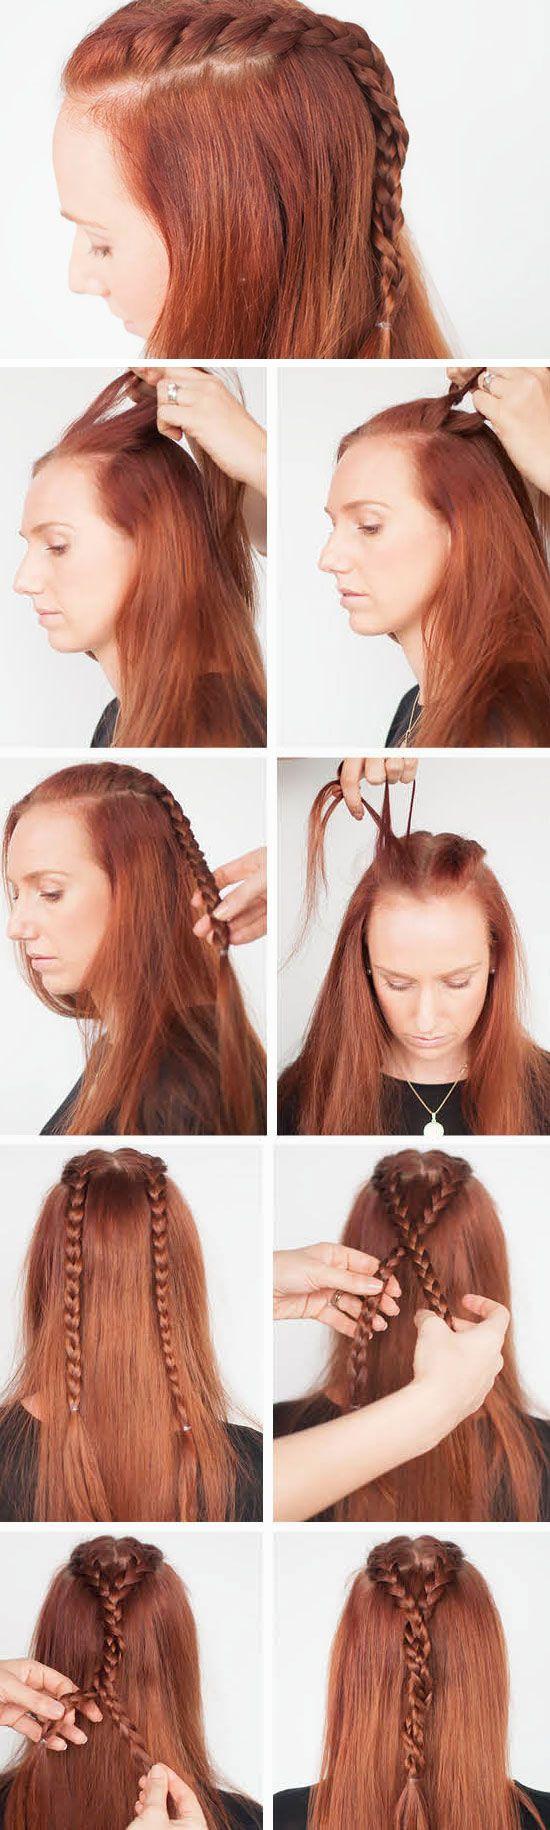 victorian era hairstyles instructions wwwpixsharkcom